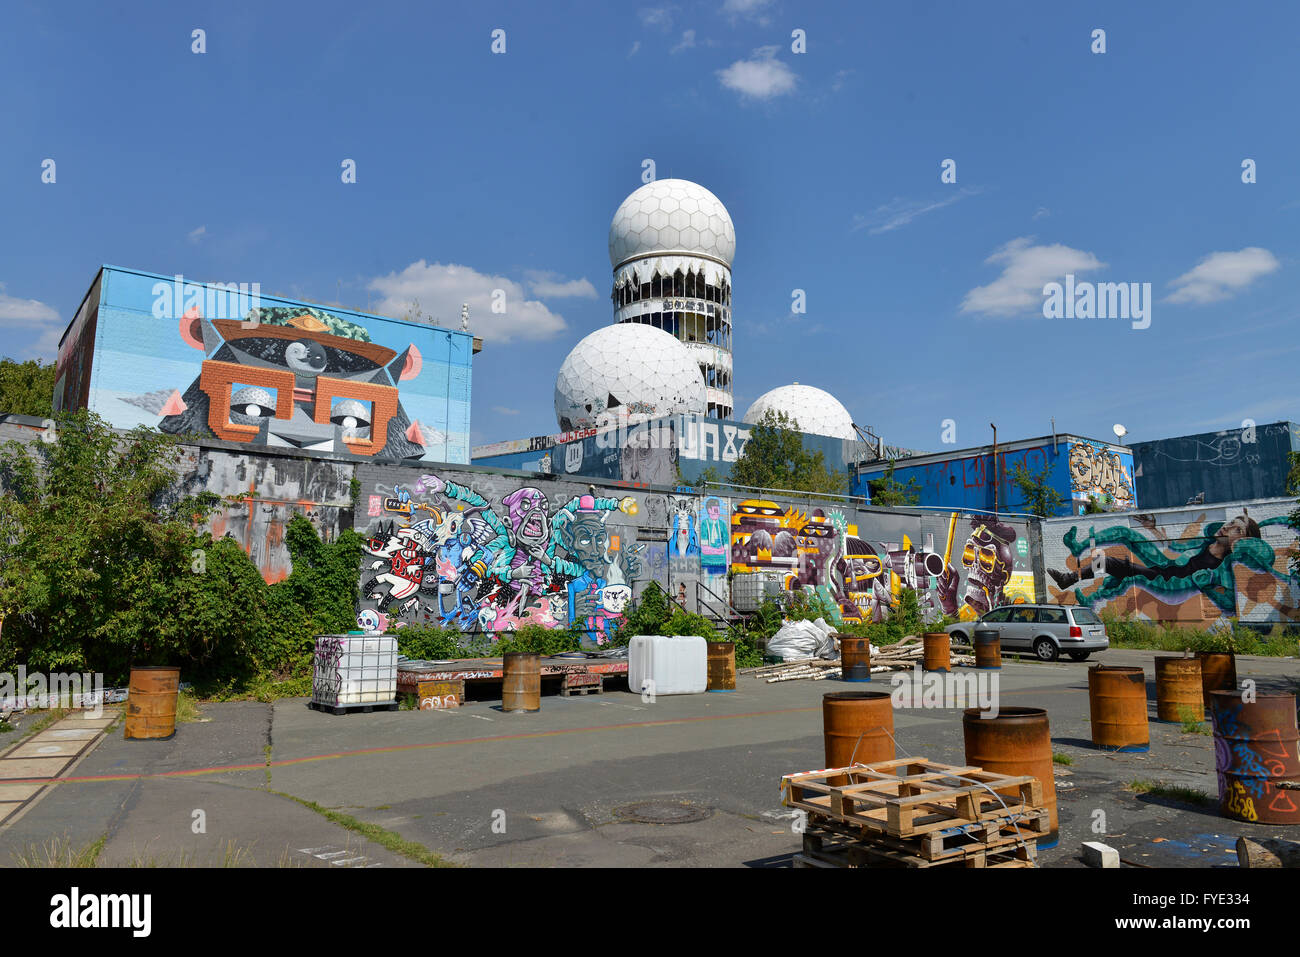 Abhoerstation, Teufelsberg, Grunewald, Berlin, Deutschland